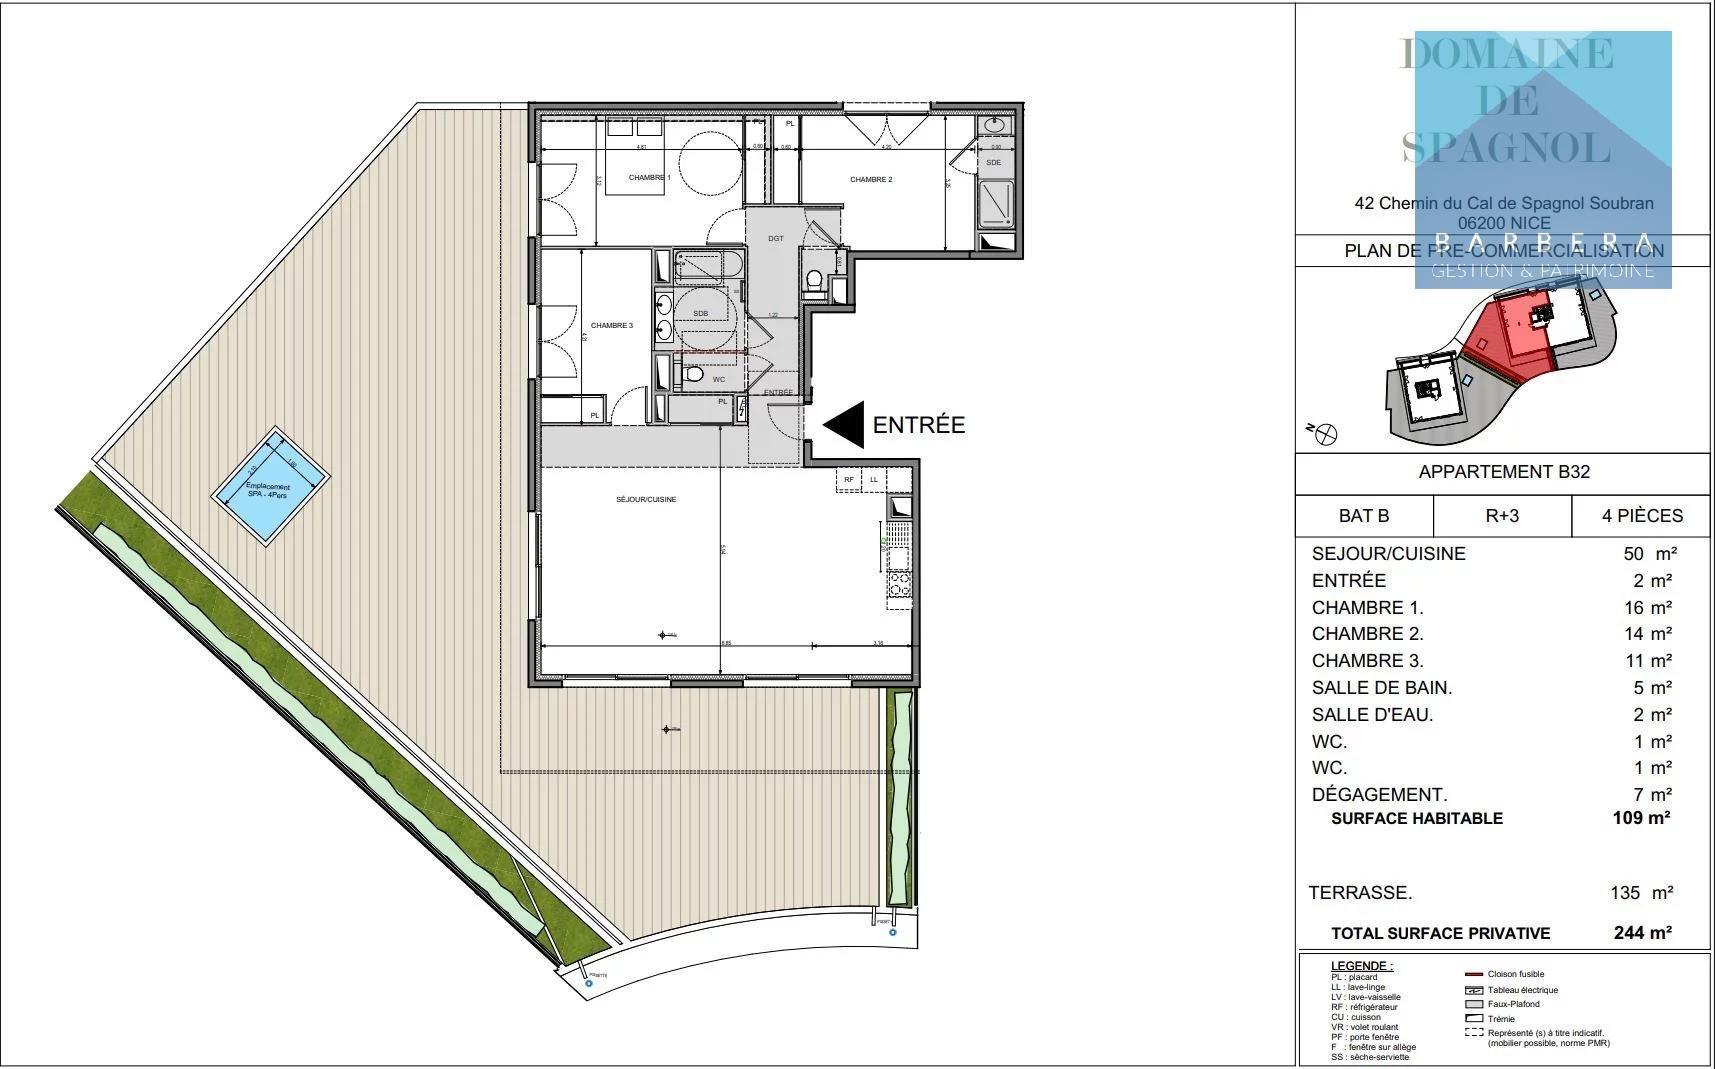 Vente appartement 110 m²